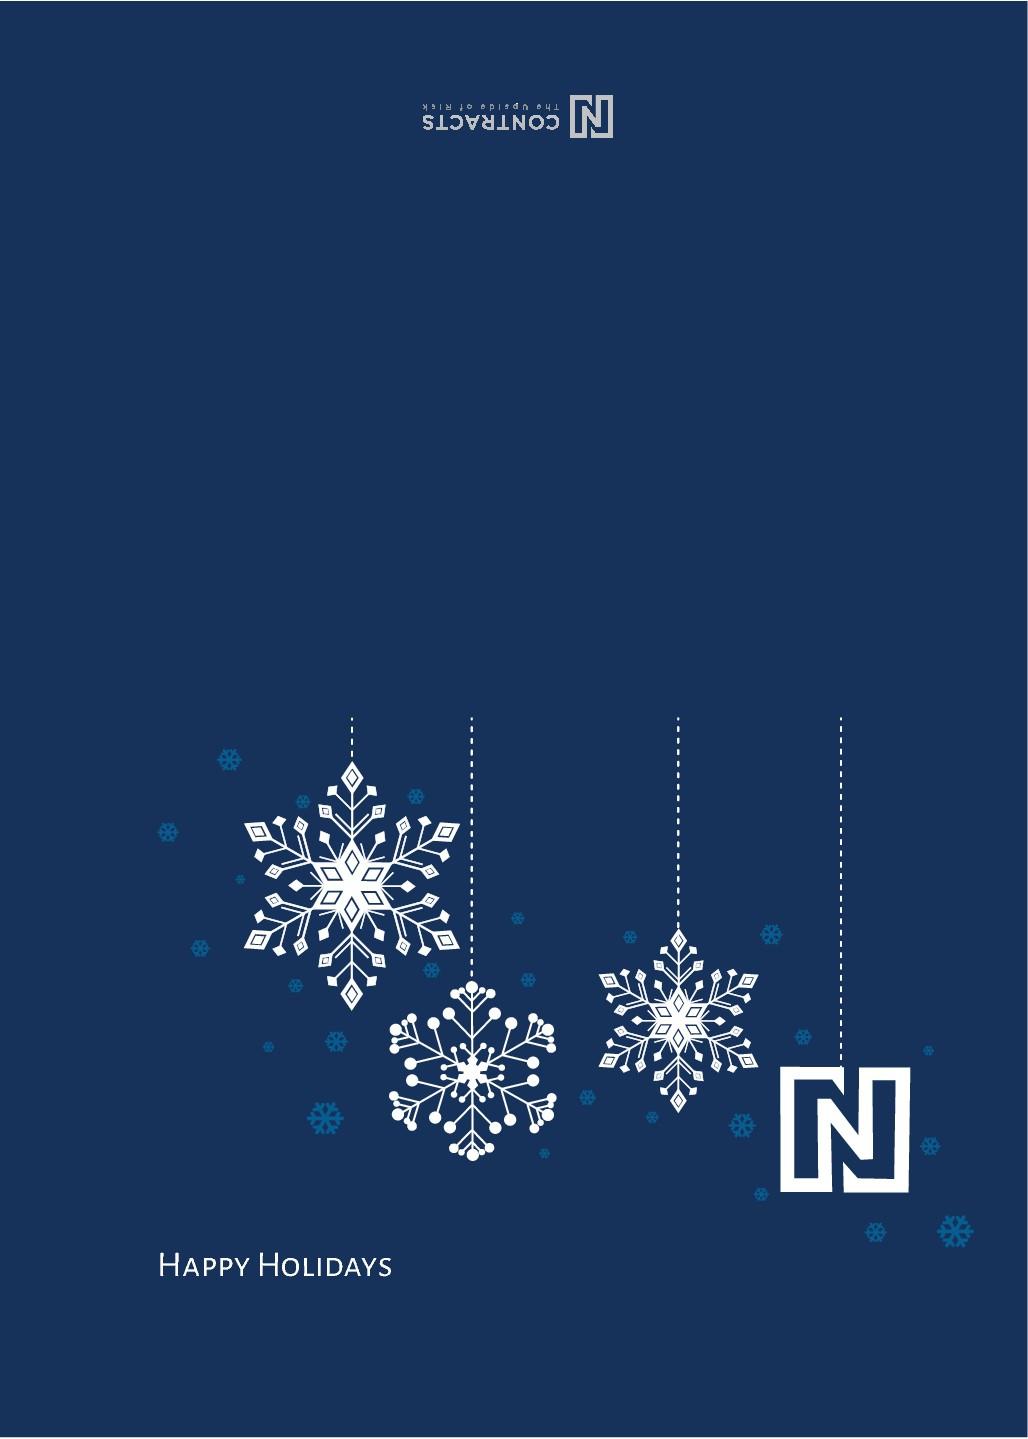 Custom Holiday Card for Software Company